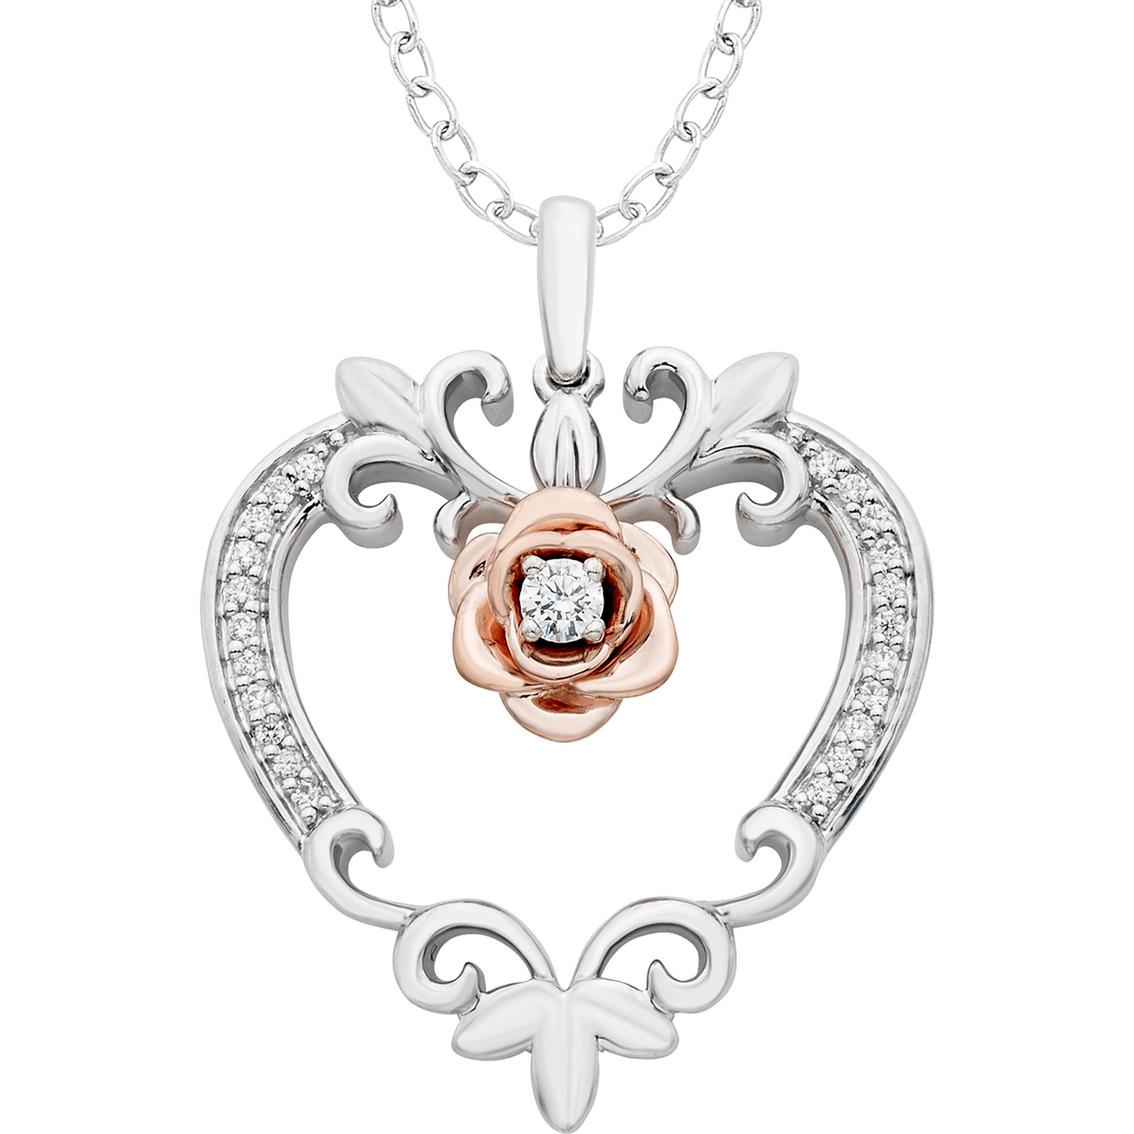 7d0a723a1298c Disney Enchanted Sterling Silver 1/10 Ctw Diamond Belle Rose Heart ...